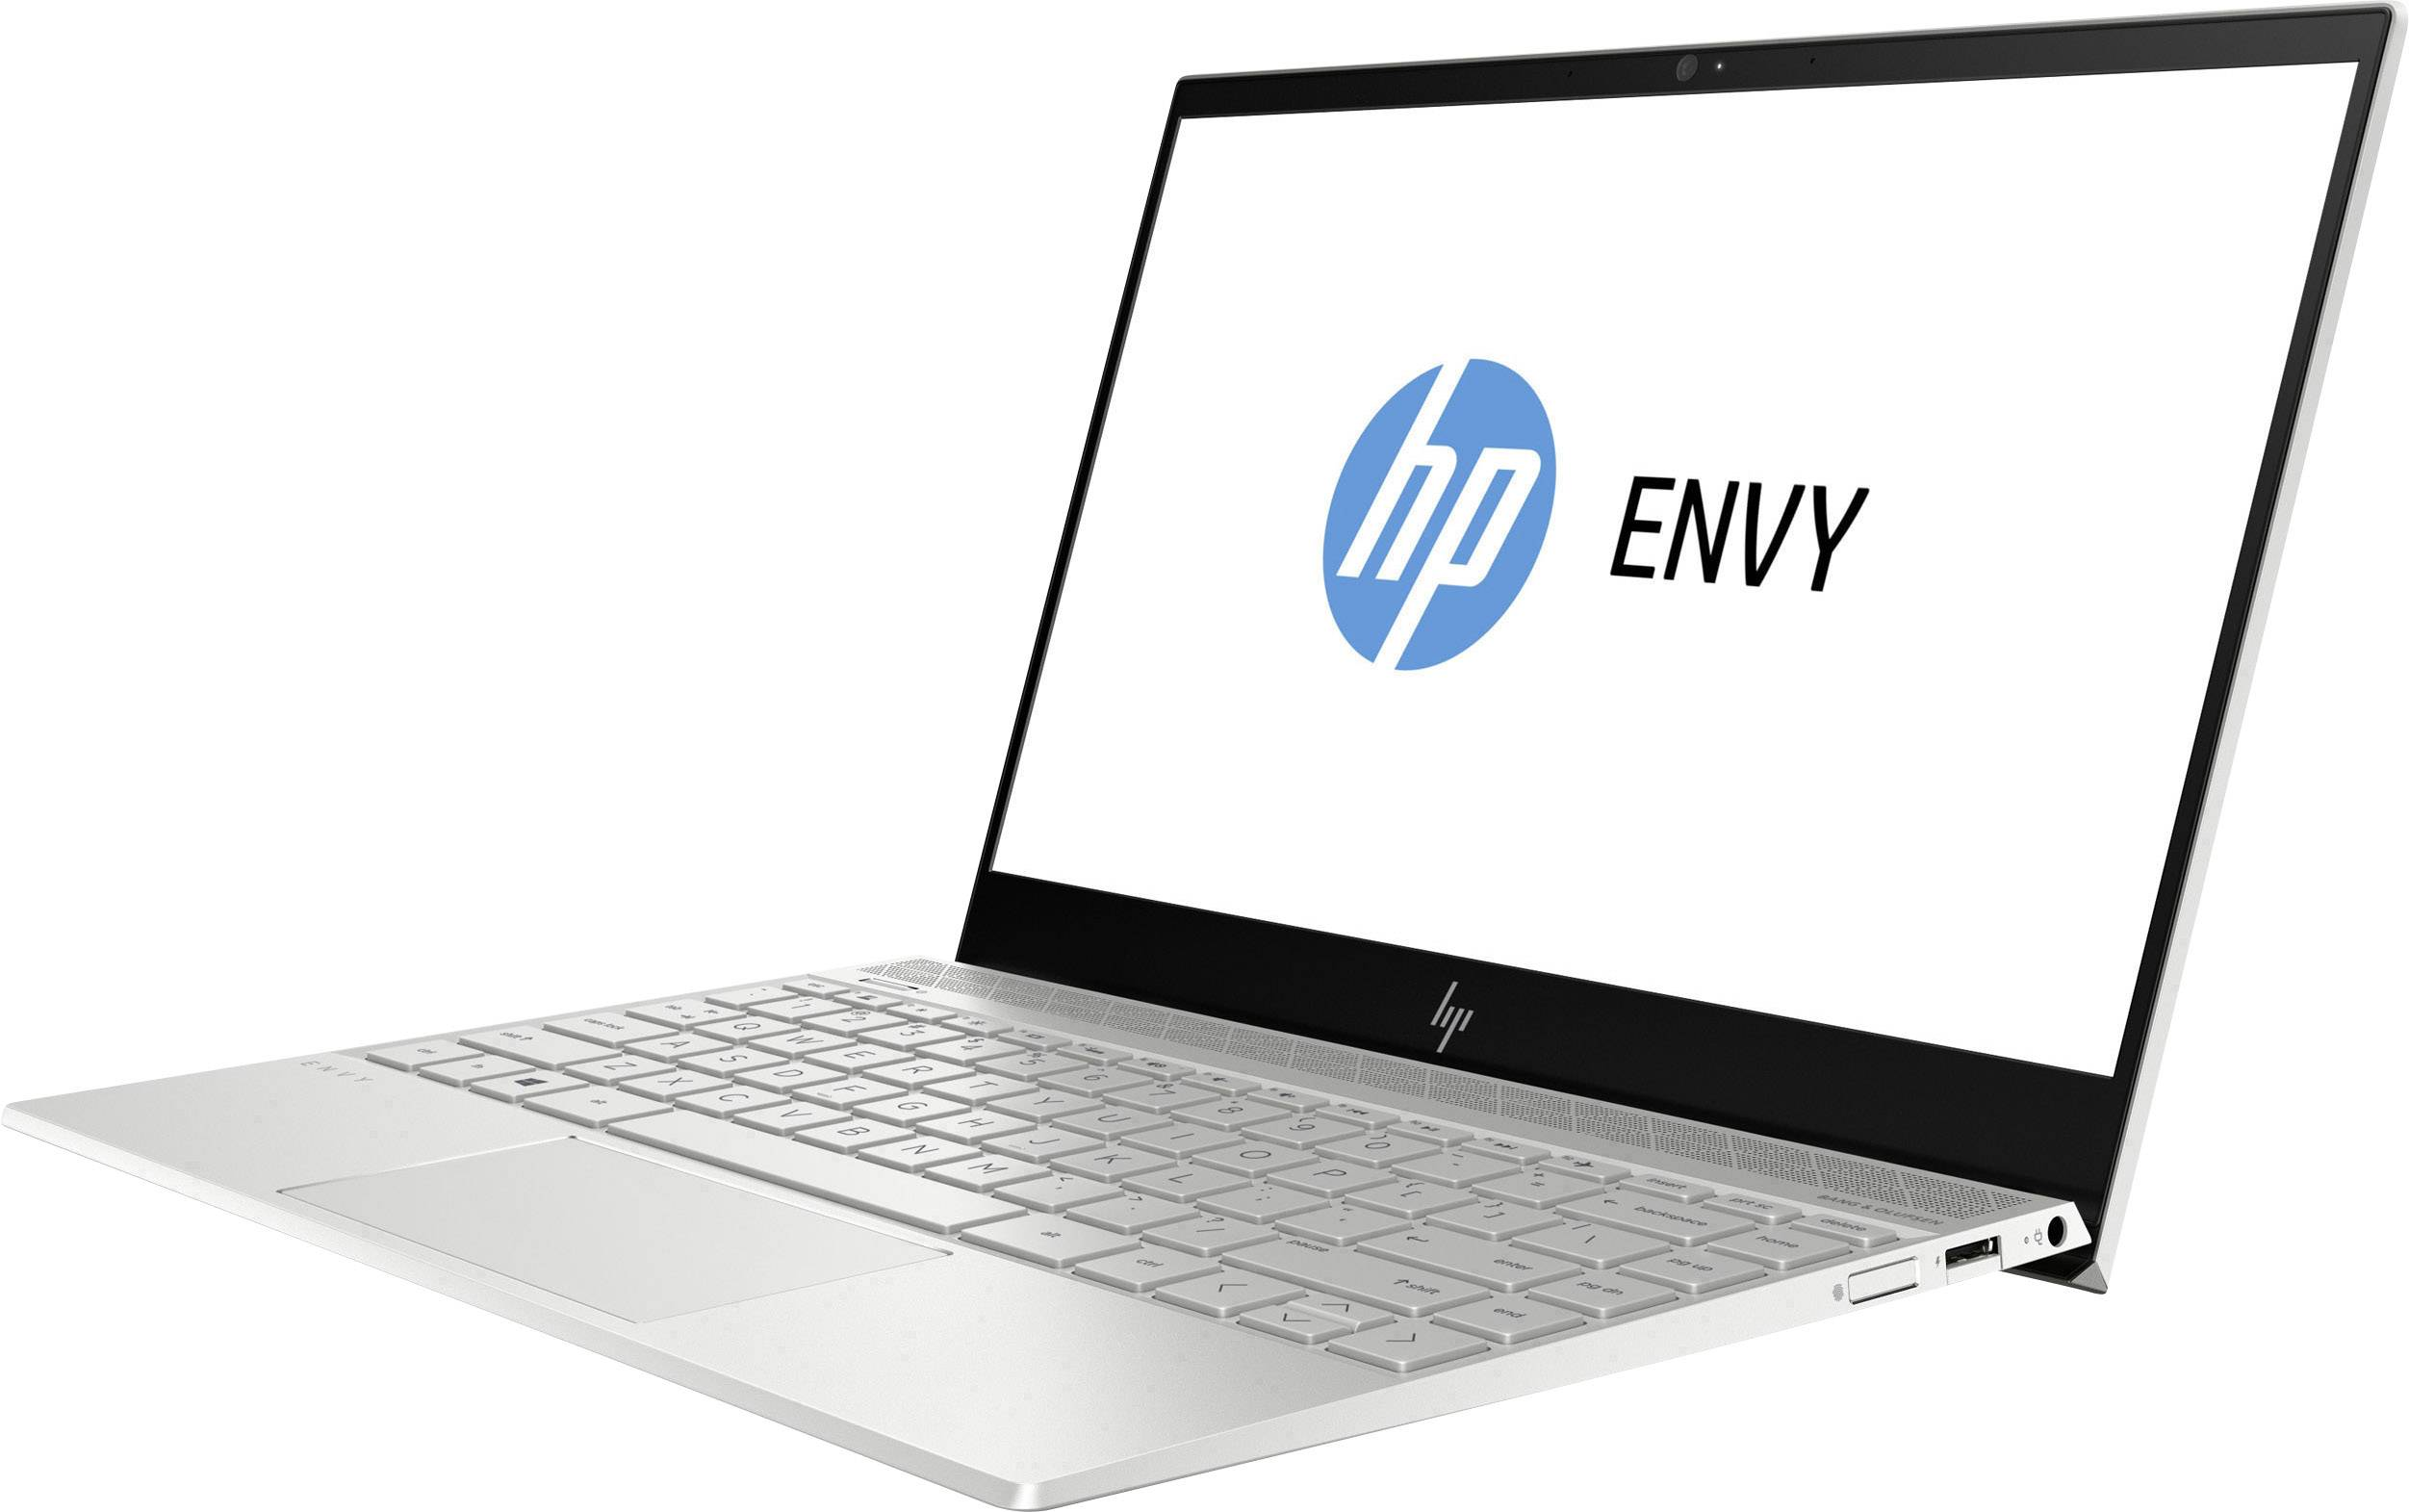 1923153583 HP Envy 13-ah0005ng 33.8 cm (13.3